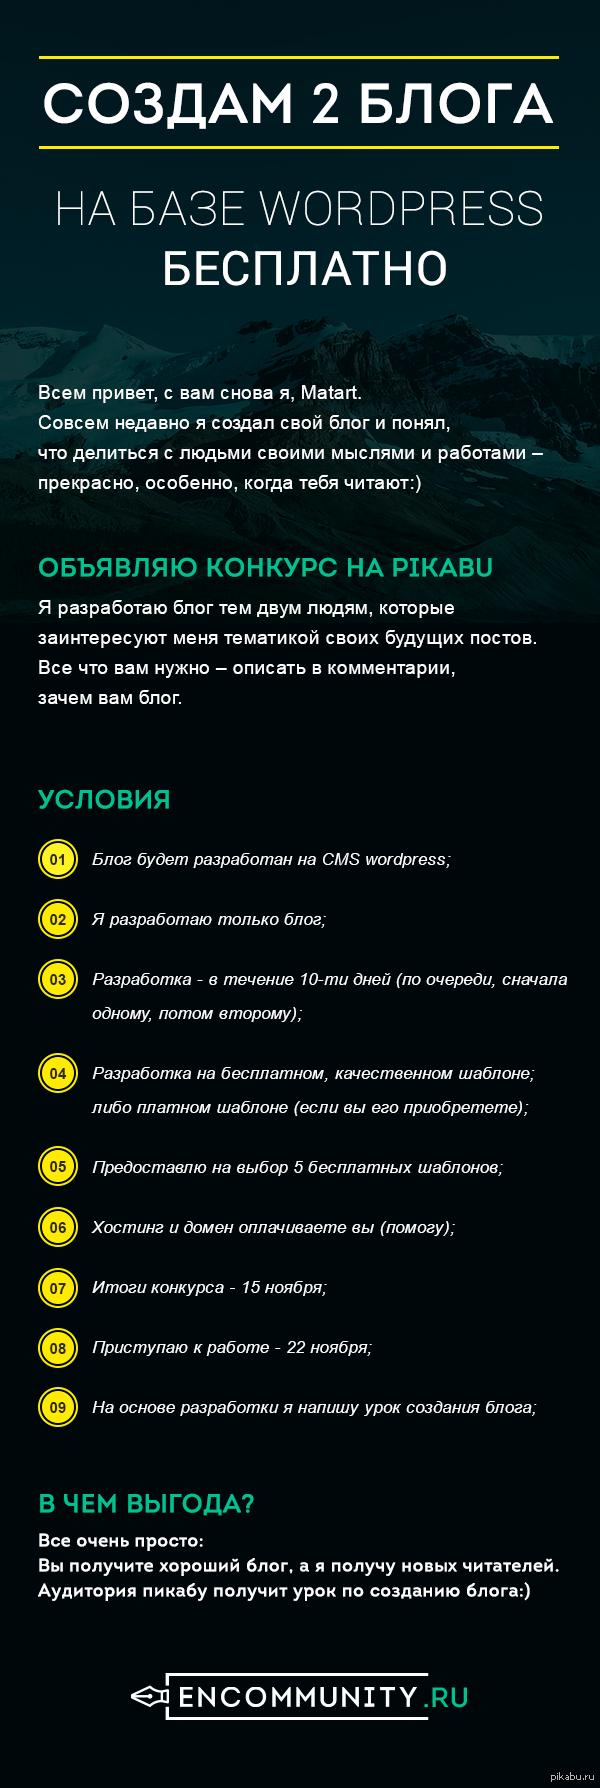 Блог бесплатно:)